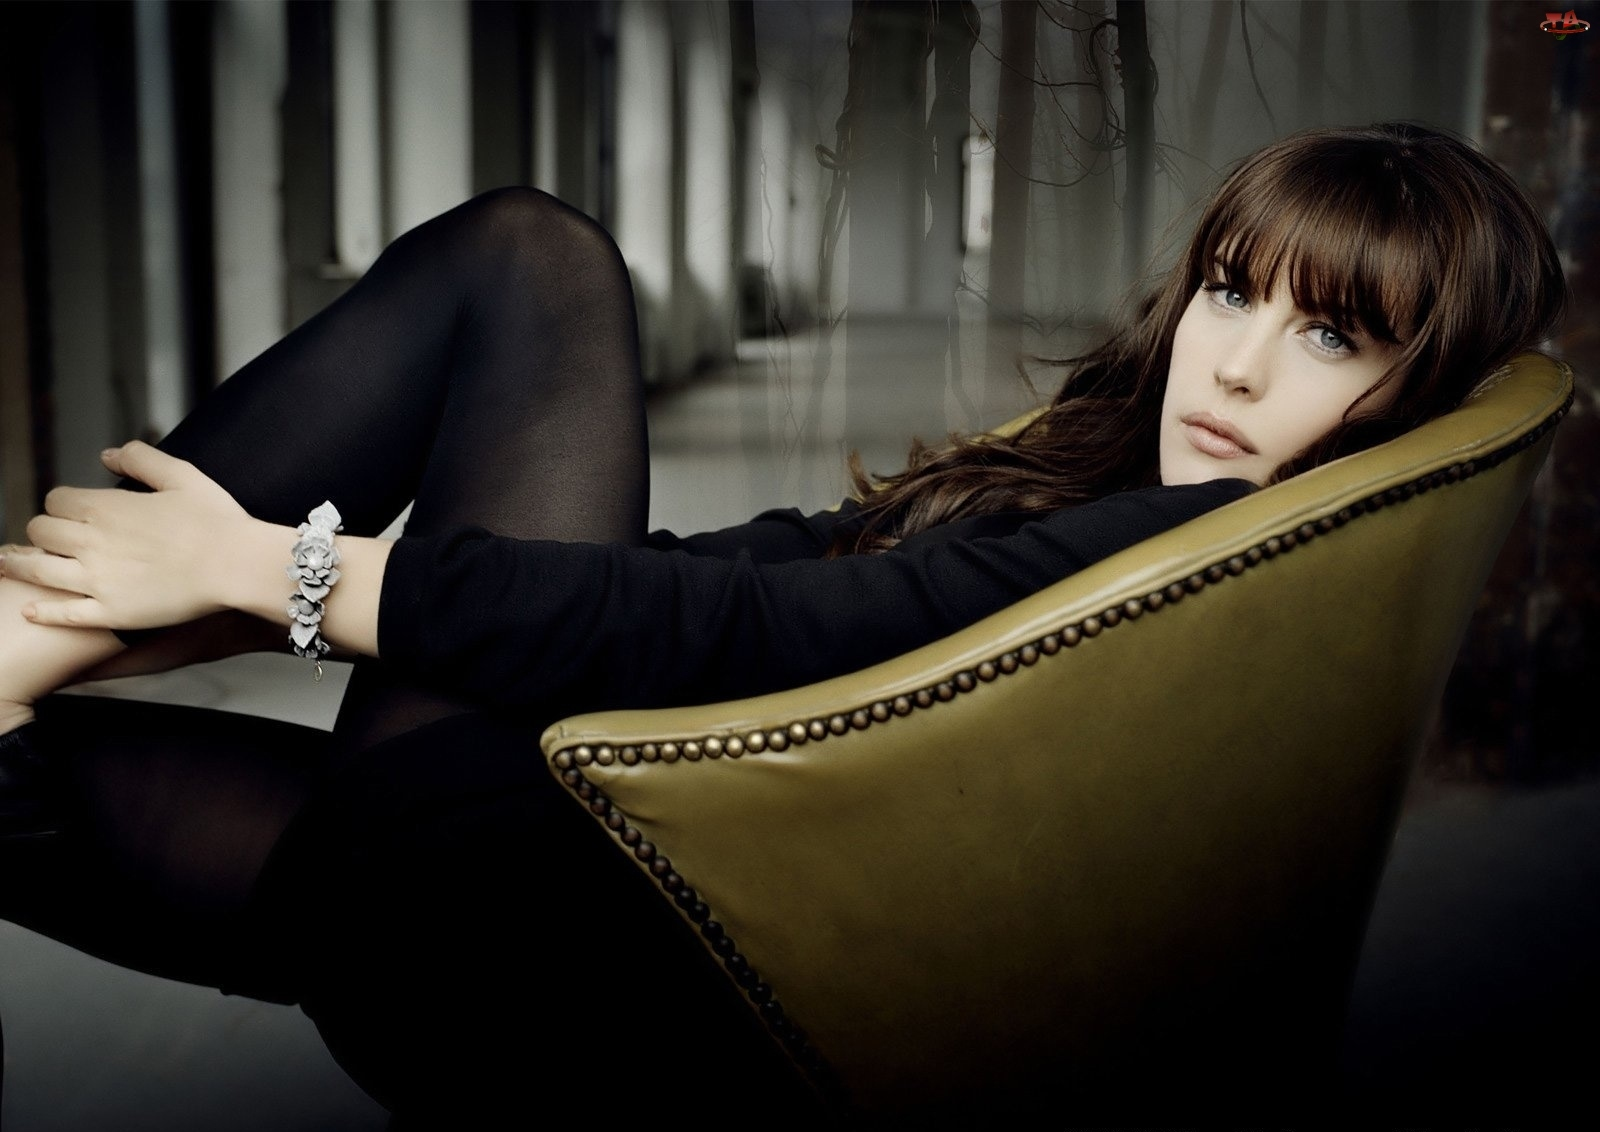 Fotel, Liv Tyler, Aktorka